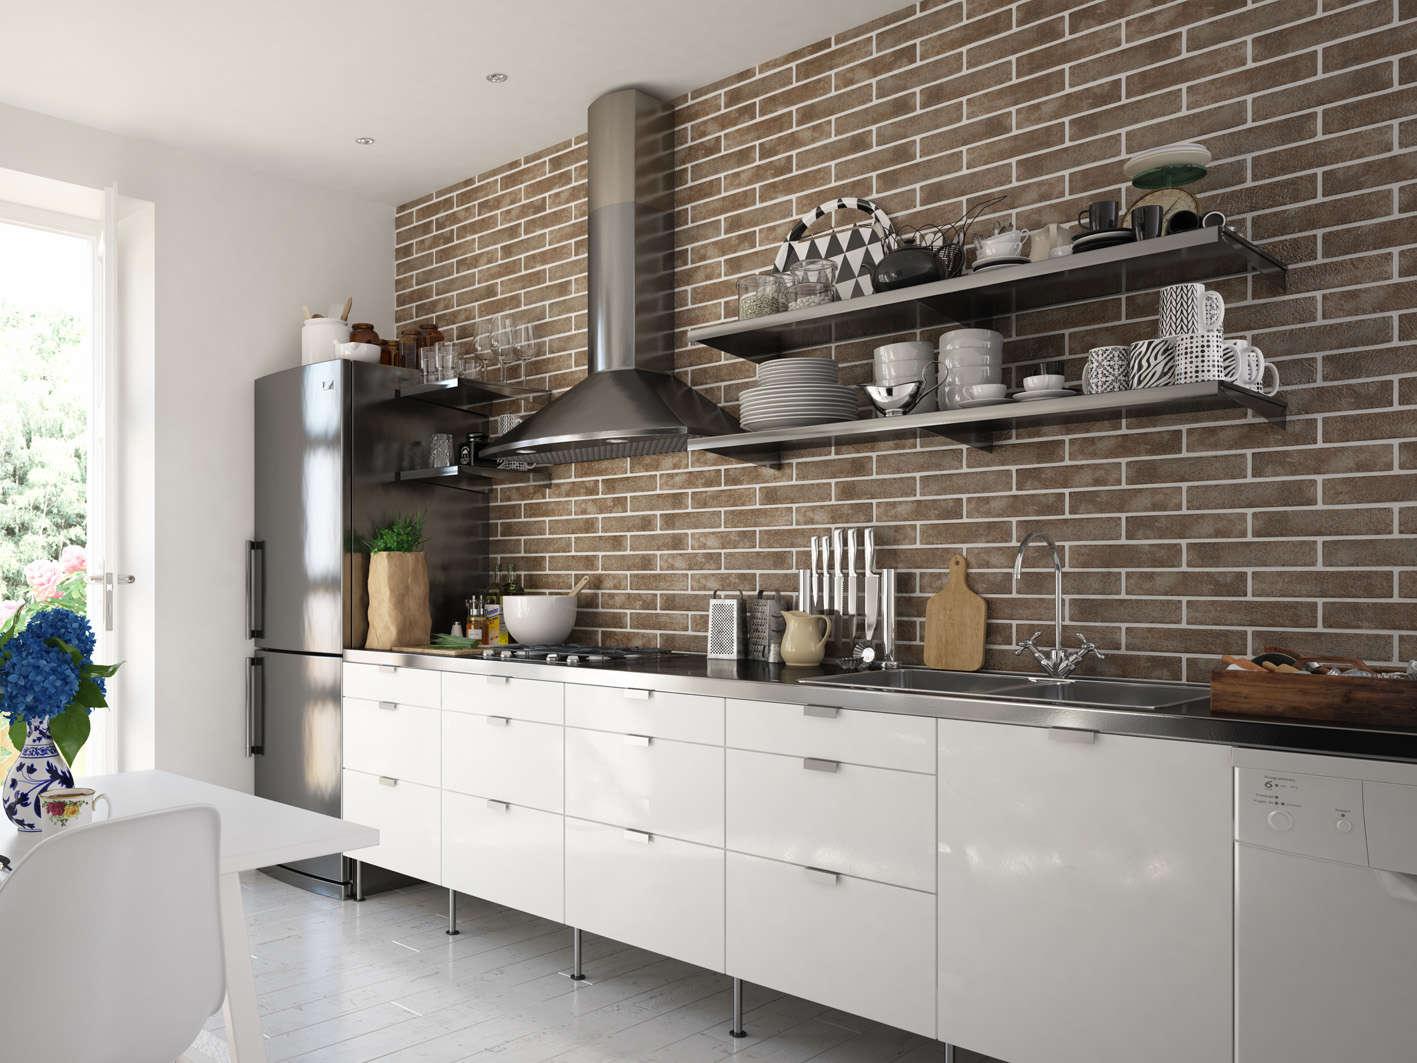 Плитка brickstyle baker street beige 221020.